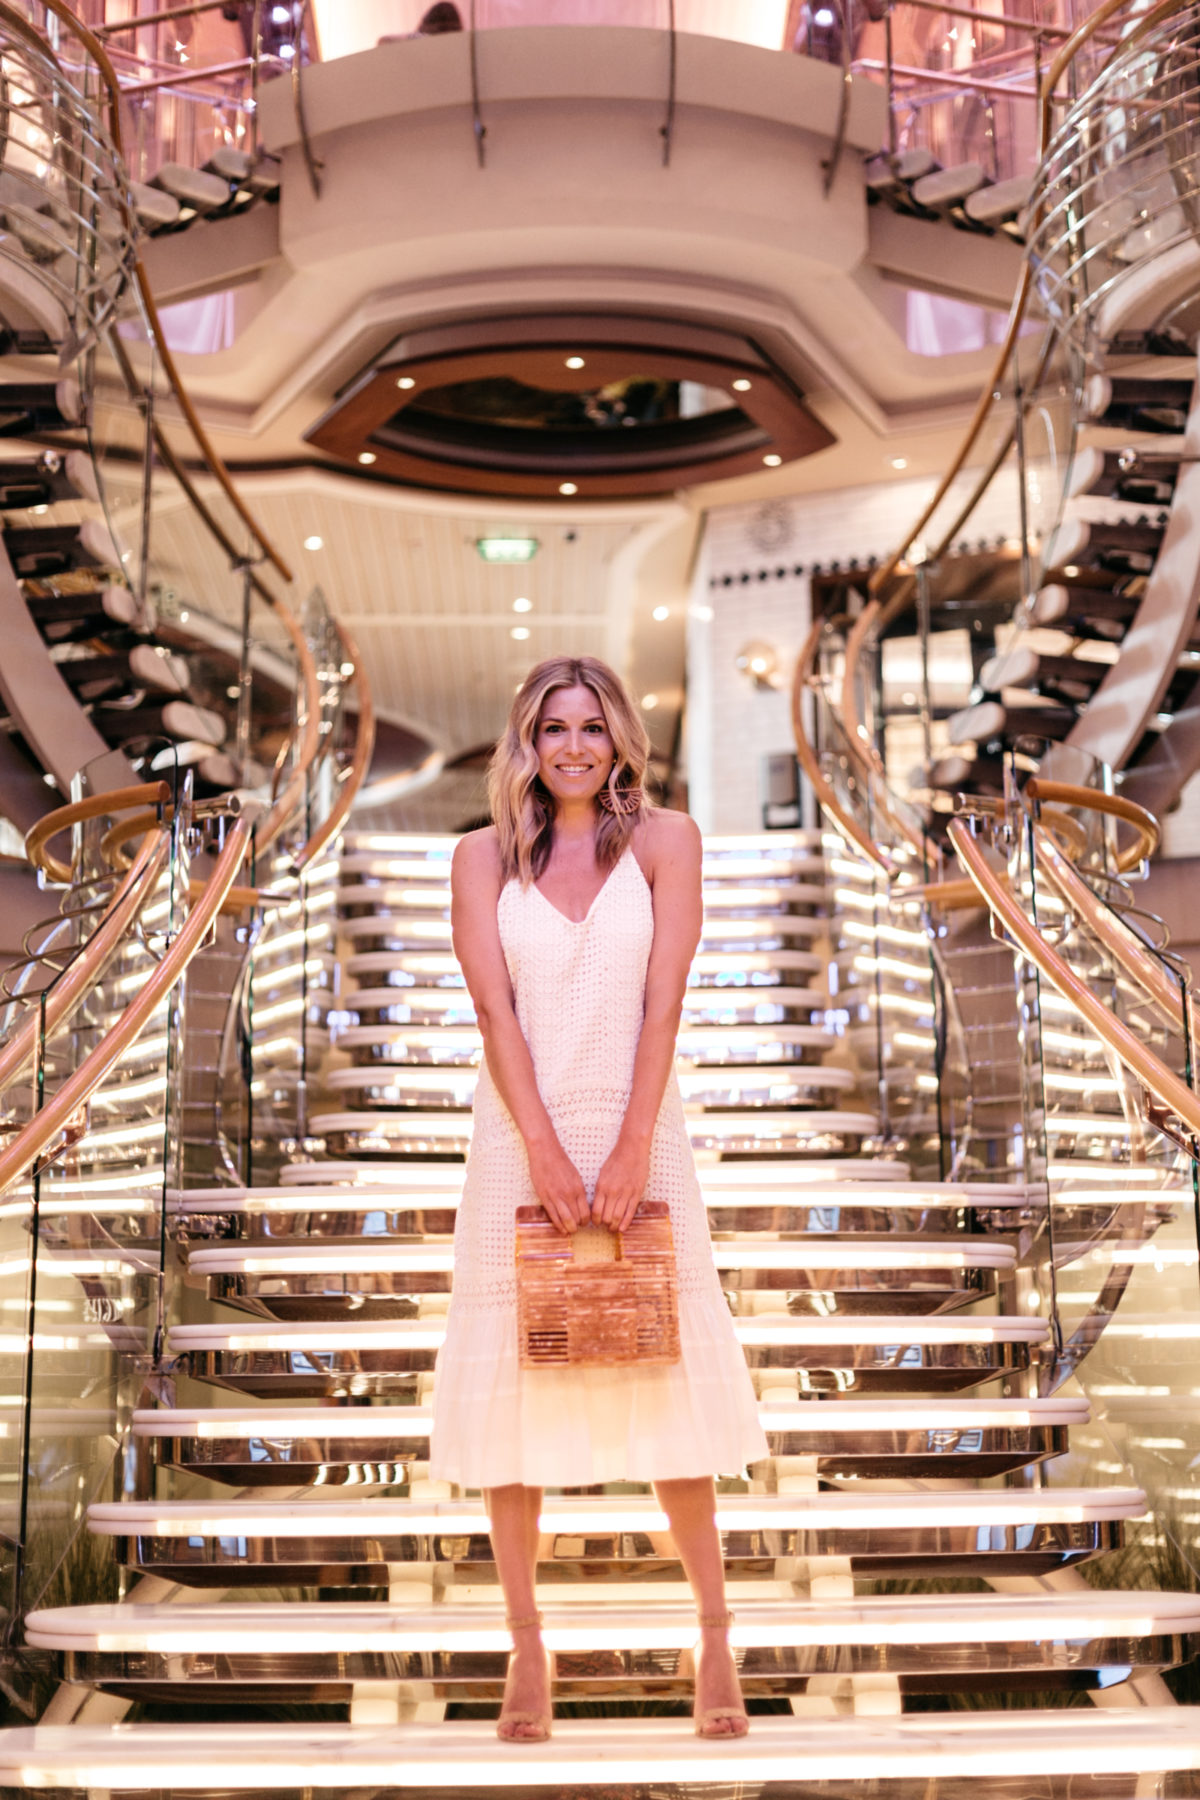 Brooke Burnett and Royal Caribbean Cruise